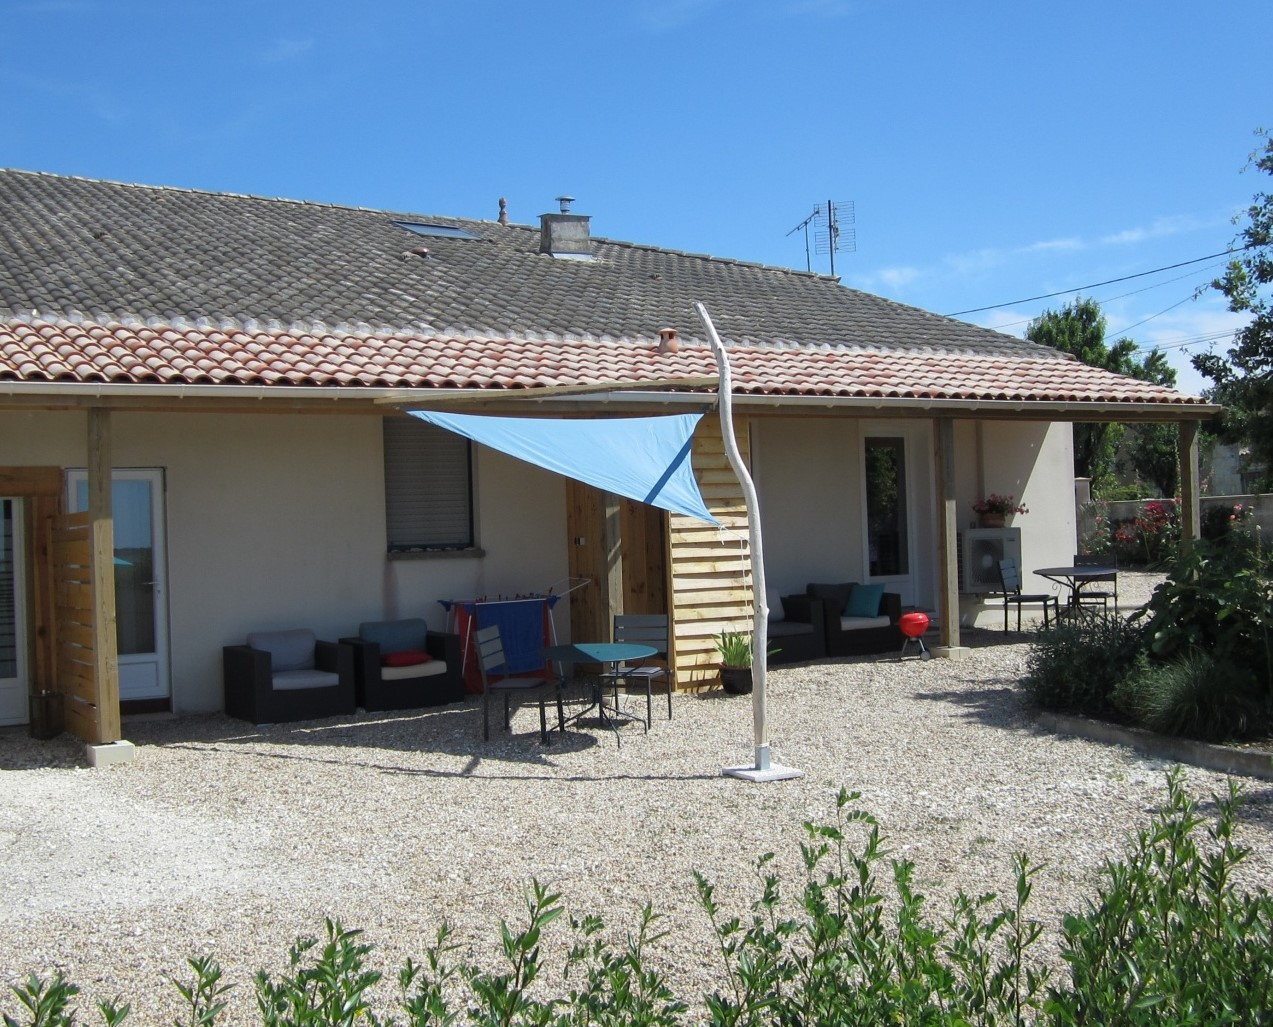 Vakantiewoning met veranda Charente-Maritime (2)